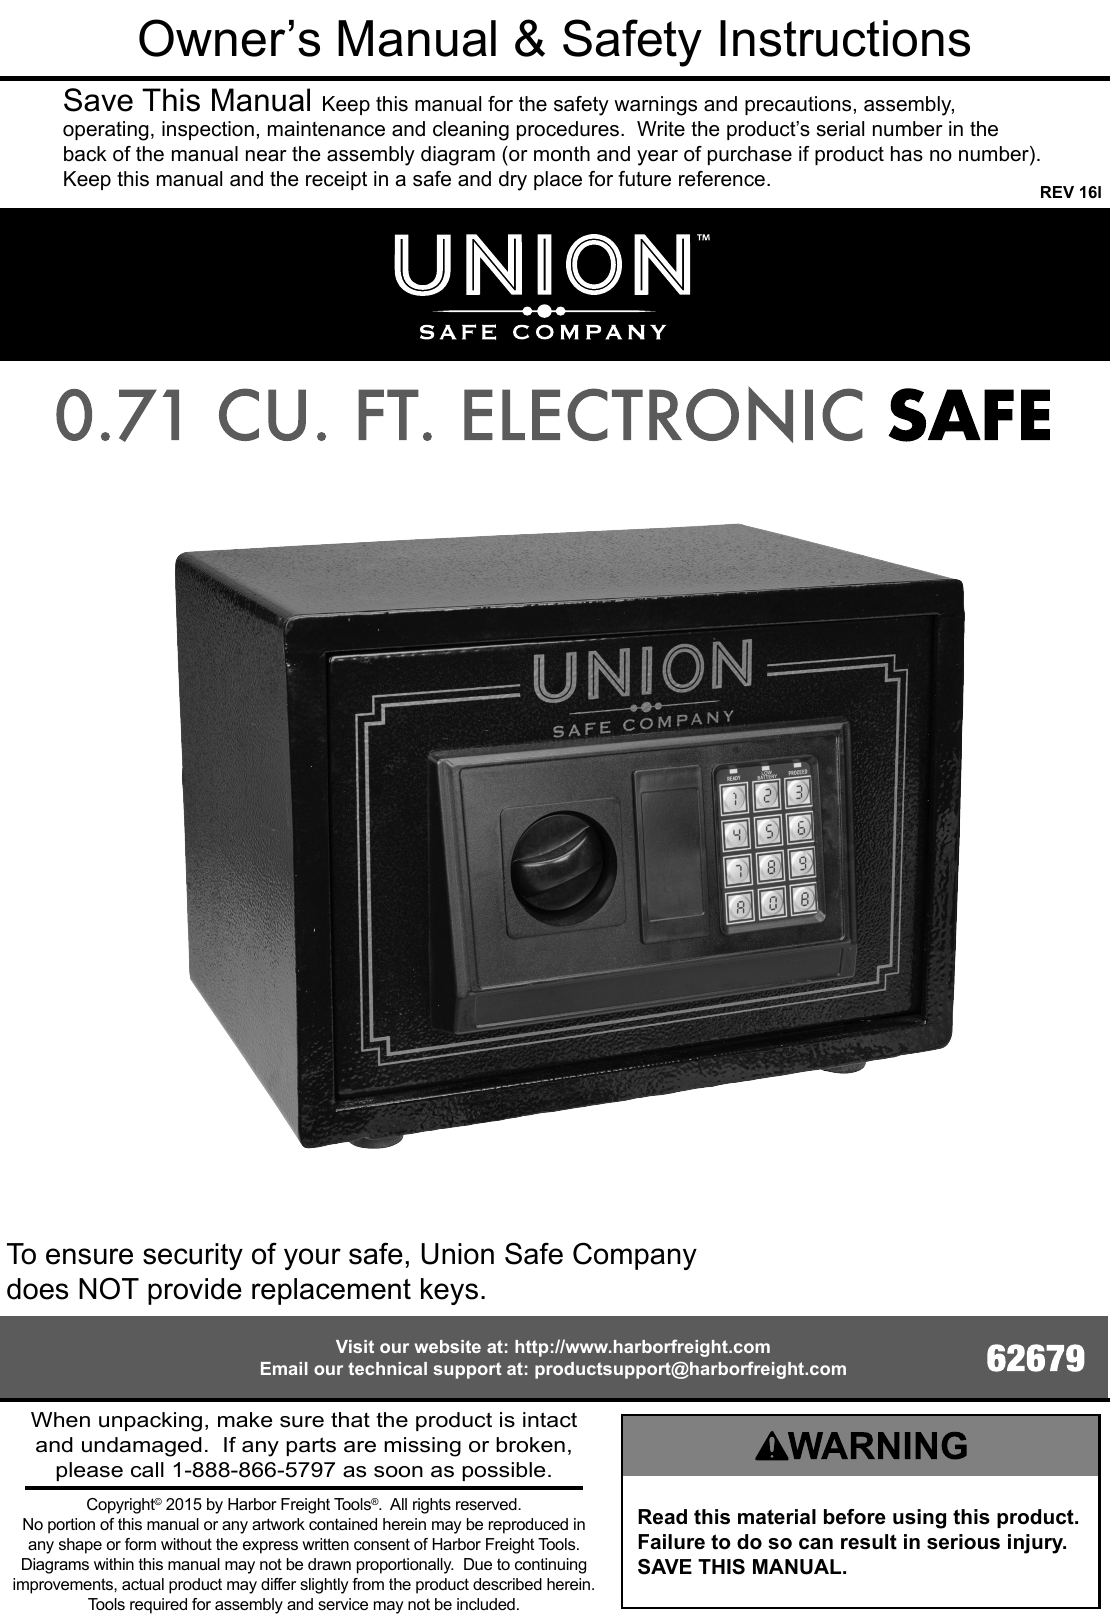 Stalwart Electronic Digital Safe Instructions Manual Guide